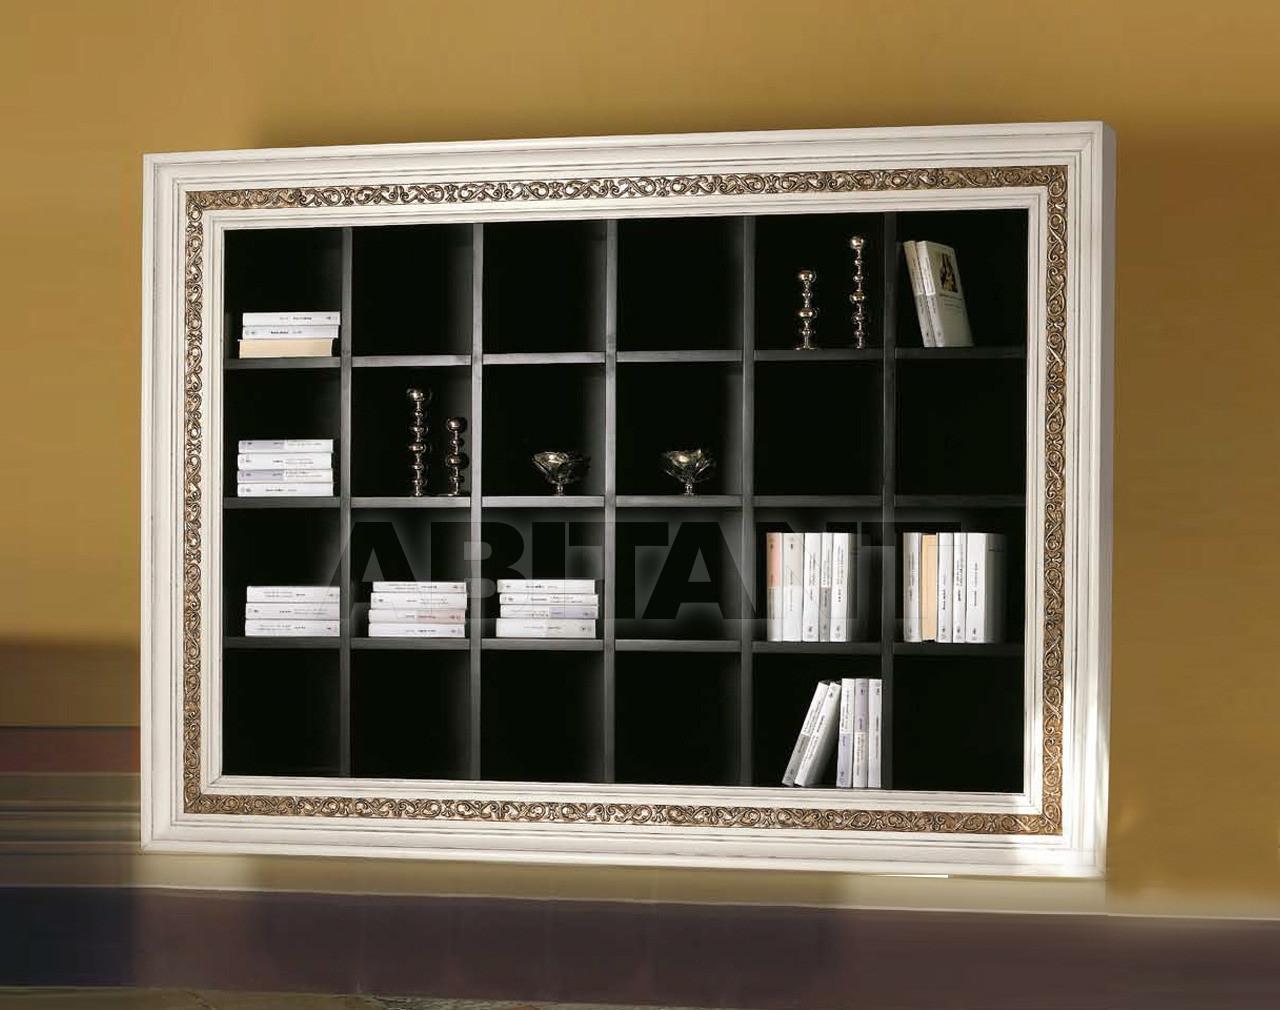 Подвесная библиотека, modenese gastone - perla del mare, от .